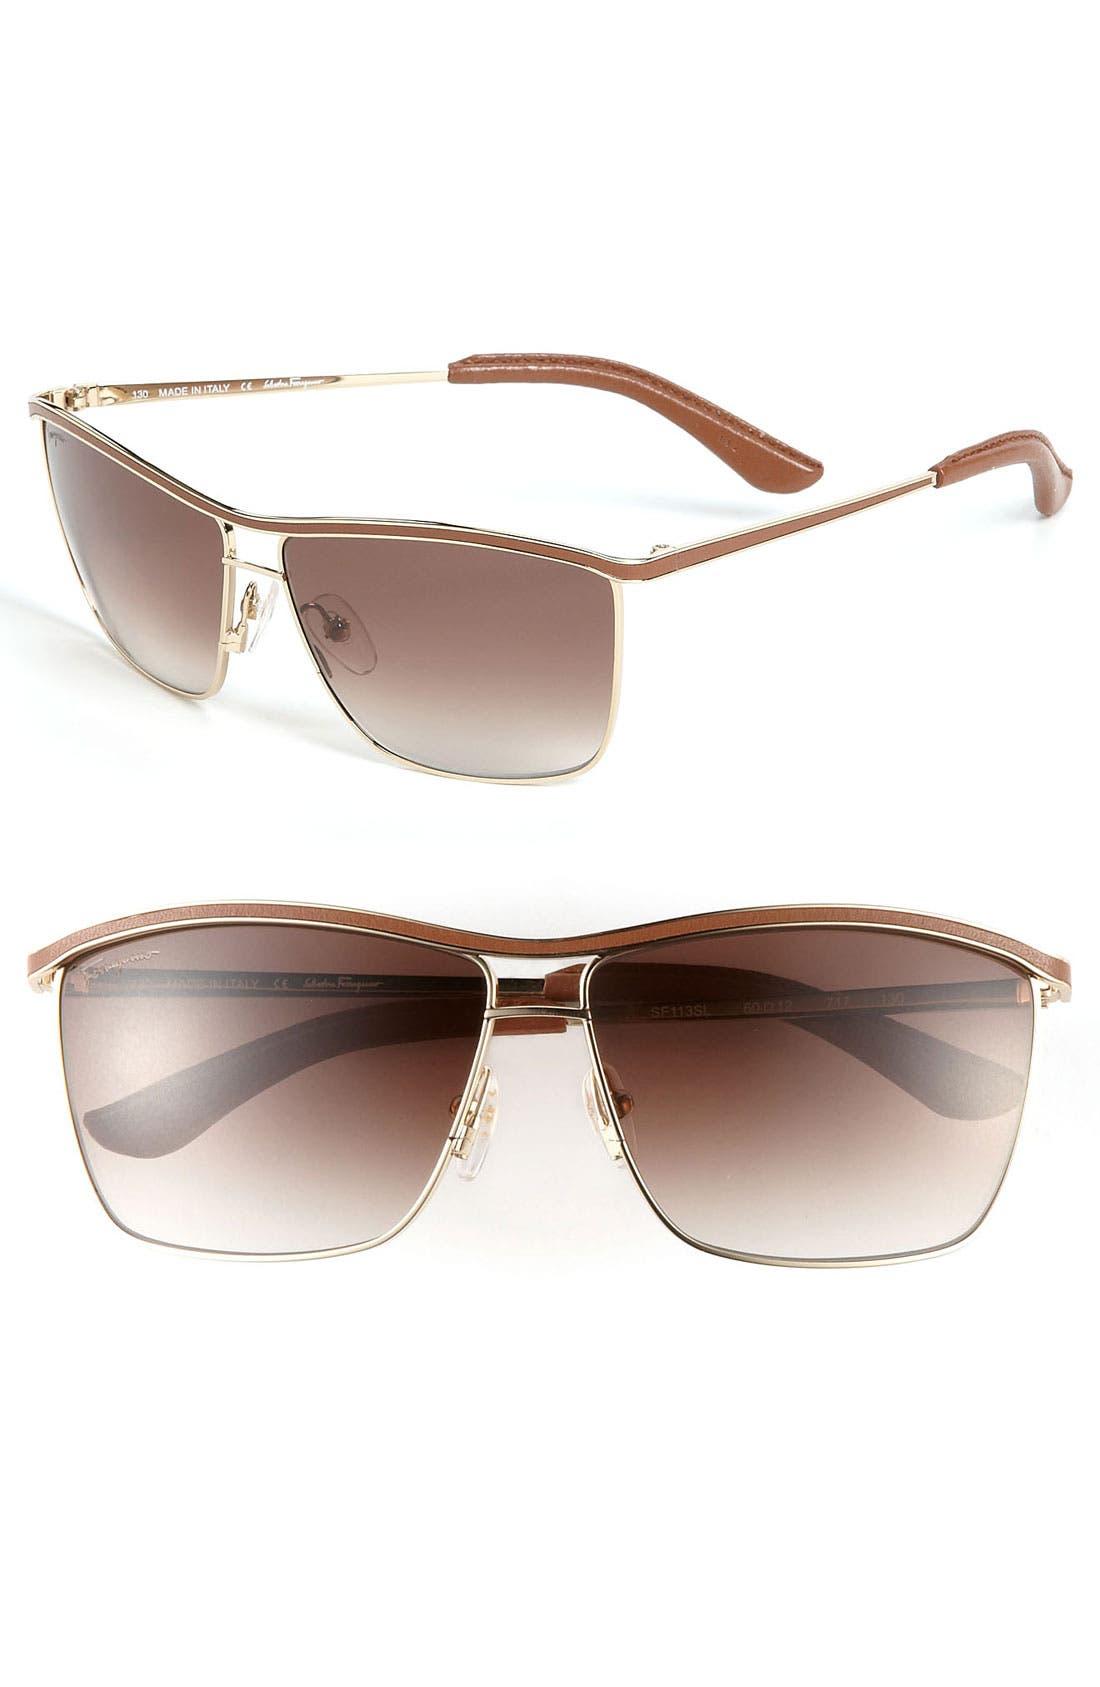 Main Image - Salvatore Ferragamo Navigator Sunglasses